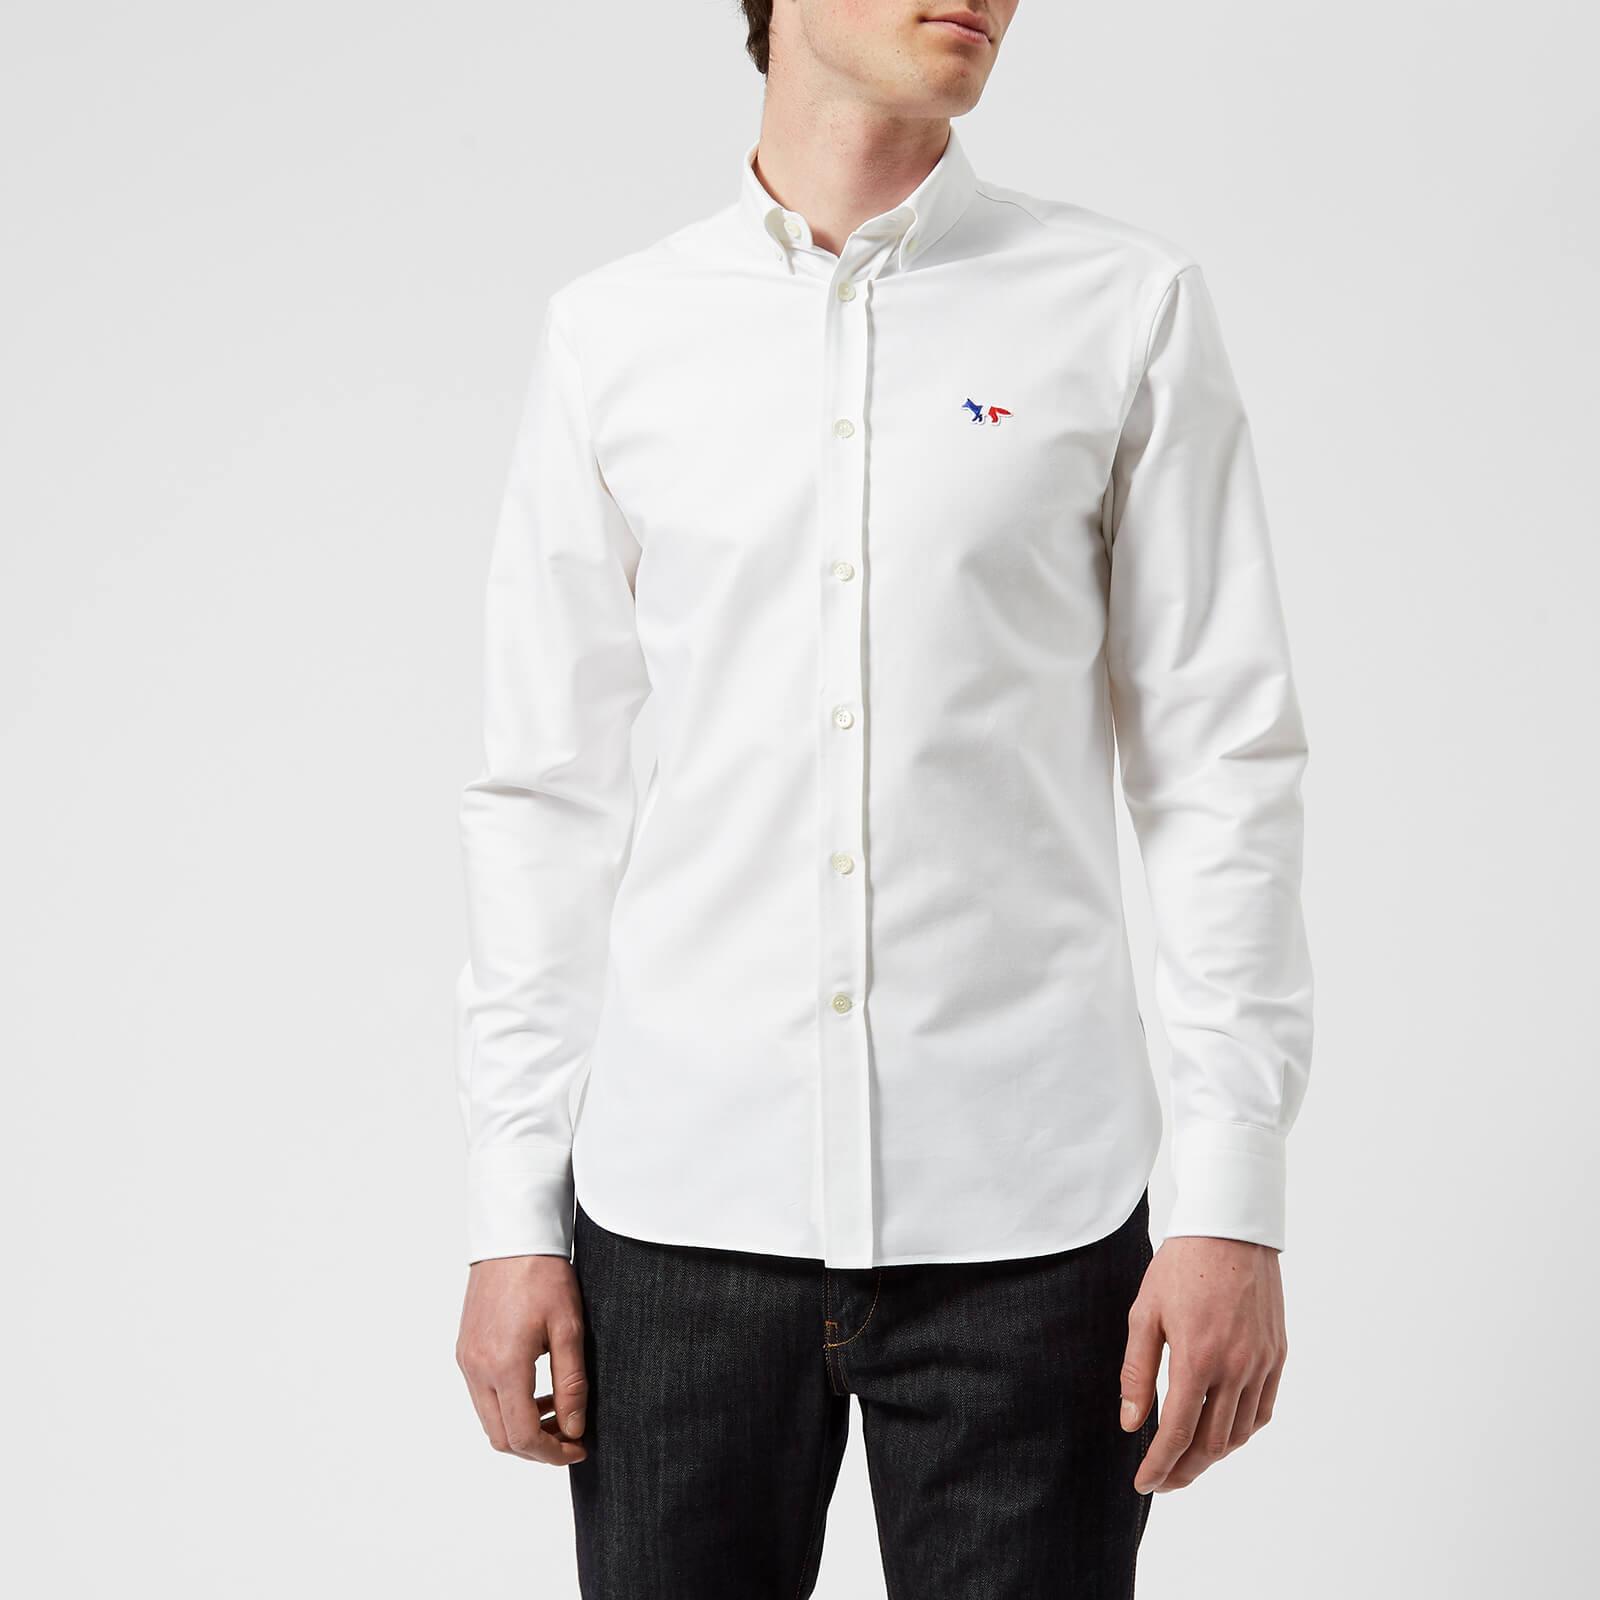 4cb660dd07a8 Maison Kitsuné Men s Tricolor Fox Patch Oxford Shirt - White - Free UK  Delivery over £50